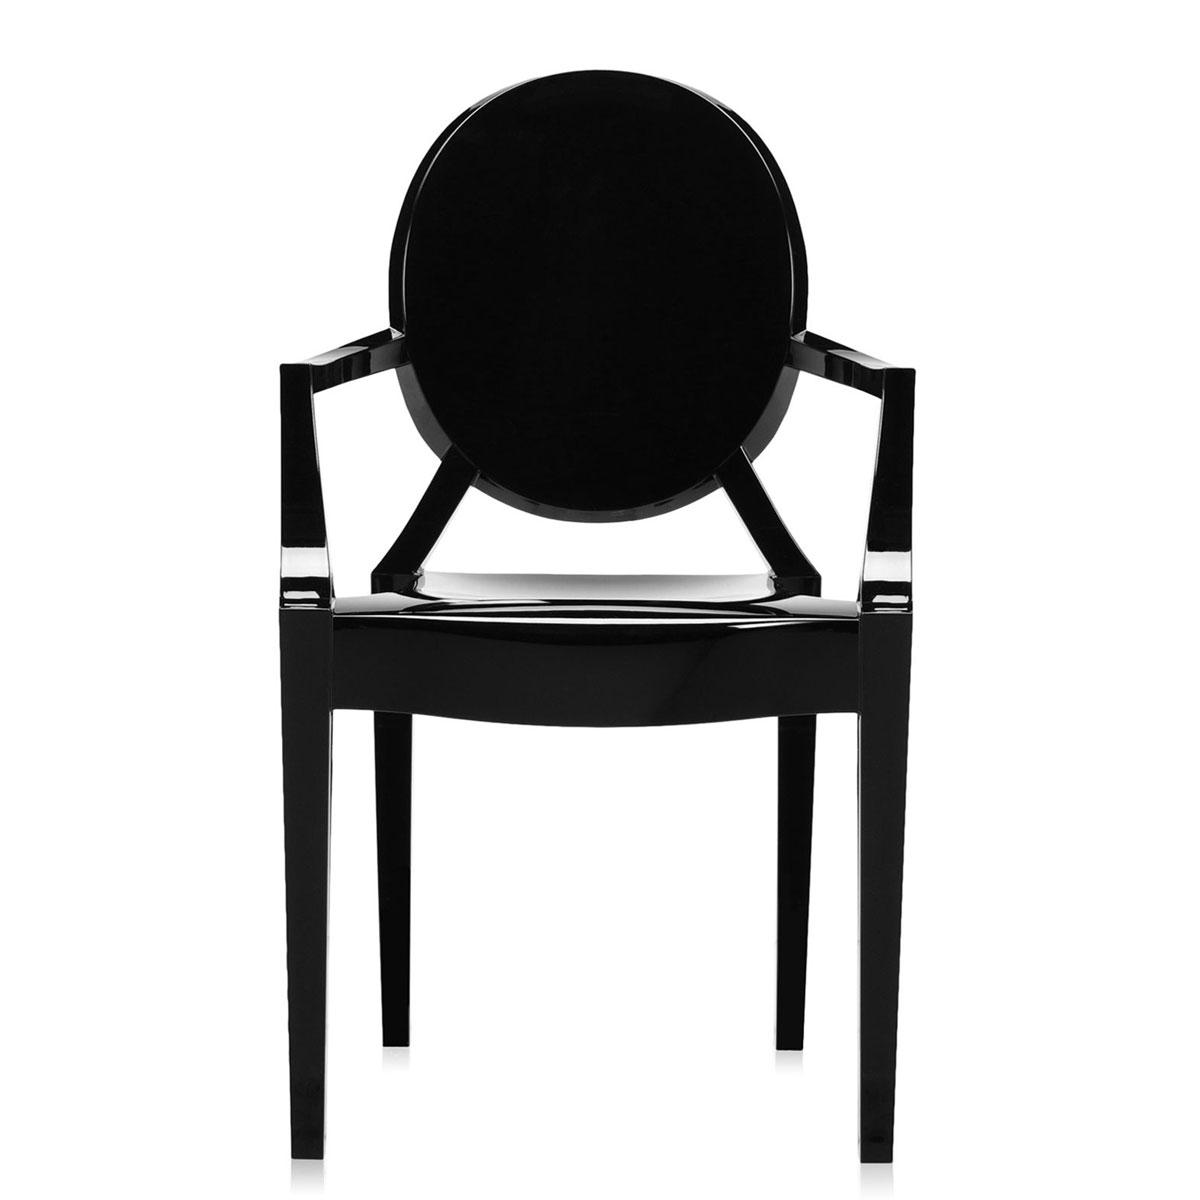 louis ghost armlehnstuhl kartell online shop rump. Black Bedroom Furniture Sets. Home Design Ideas